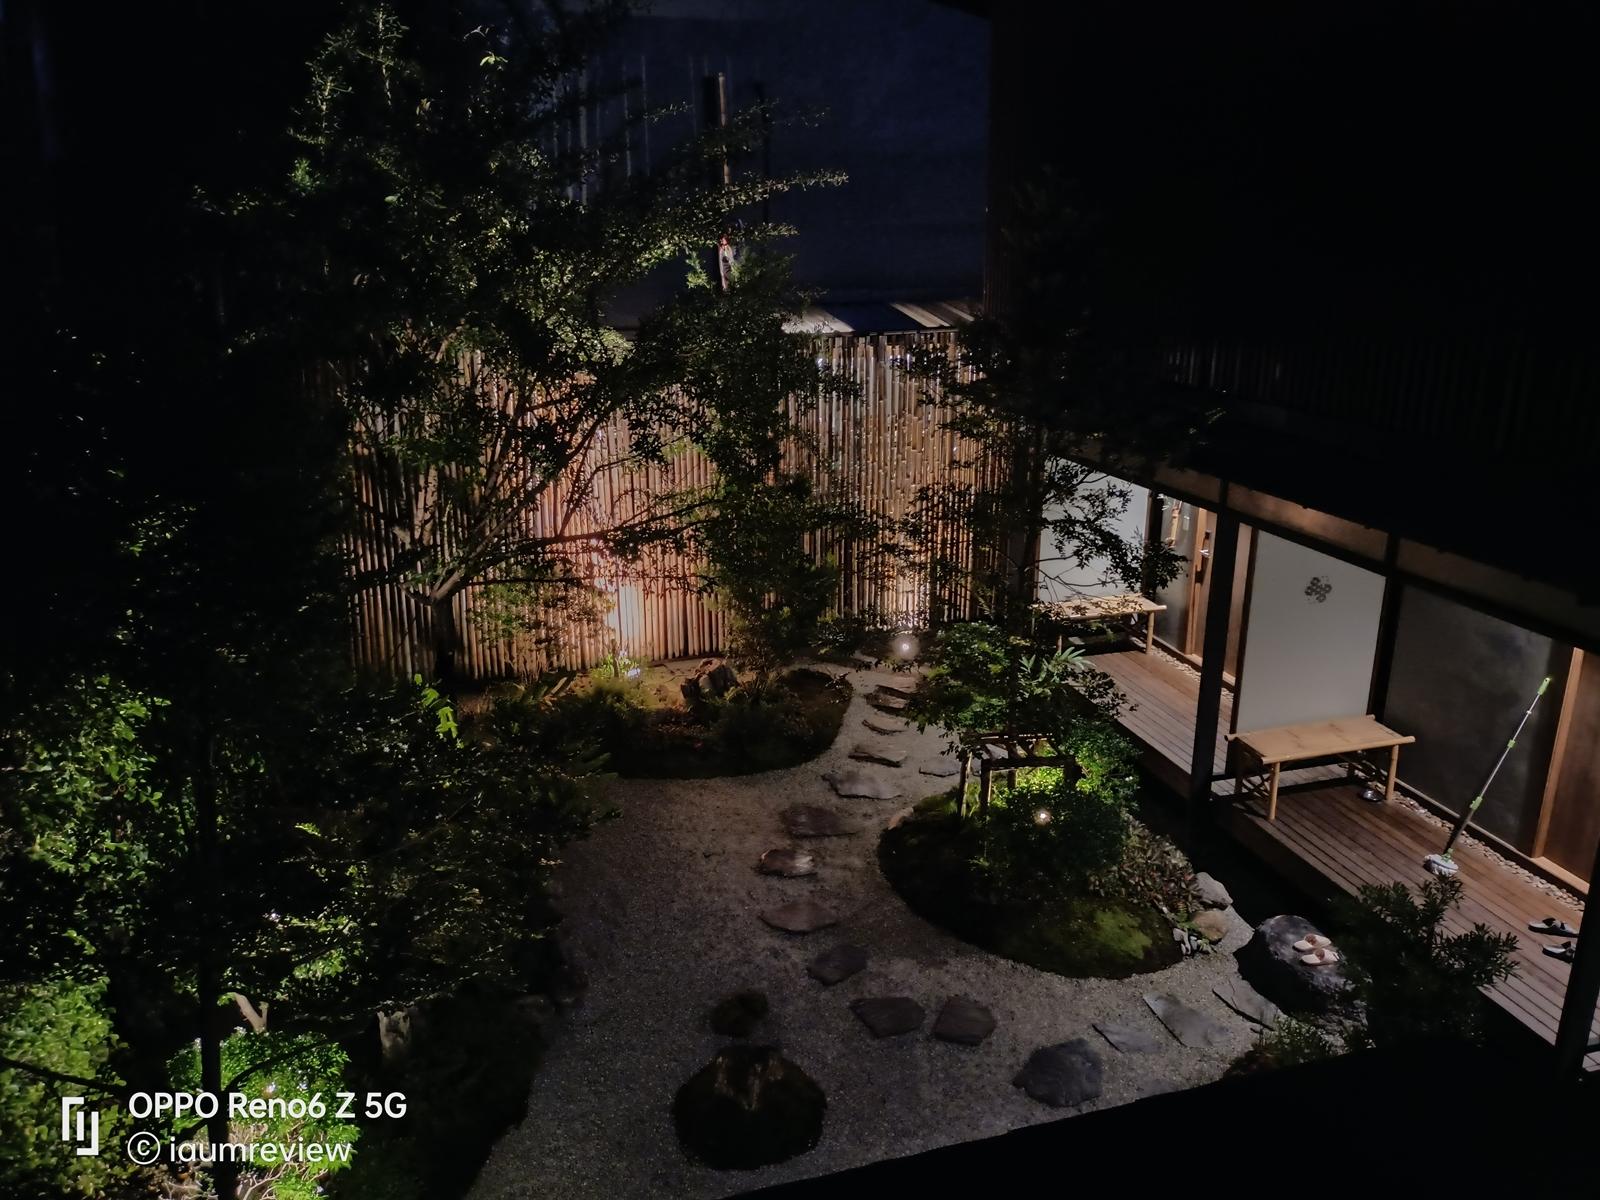 Night Mode OPPO Reno6Z 5G